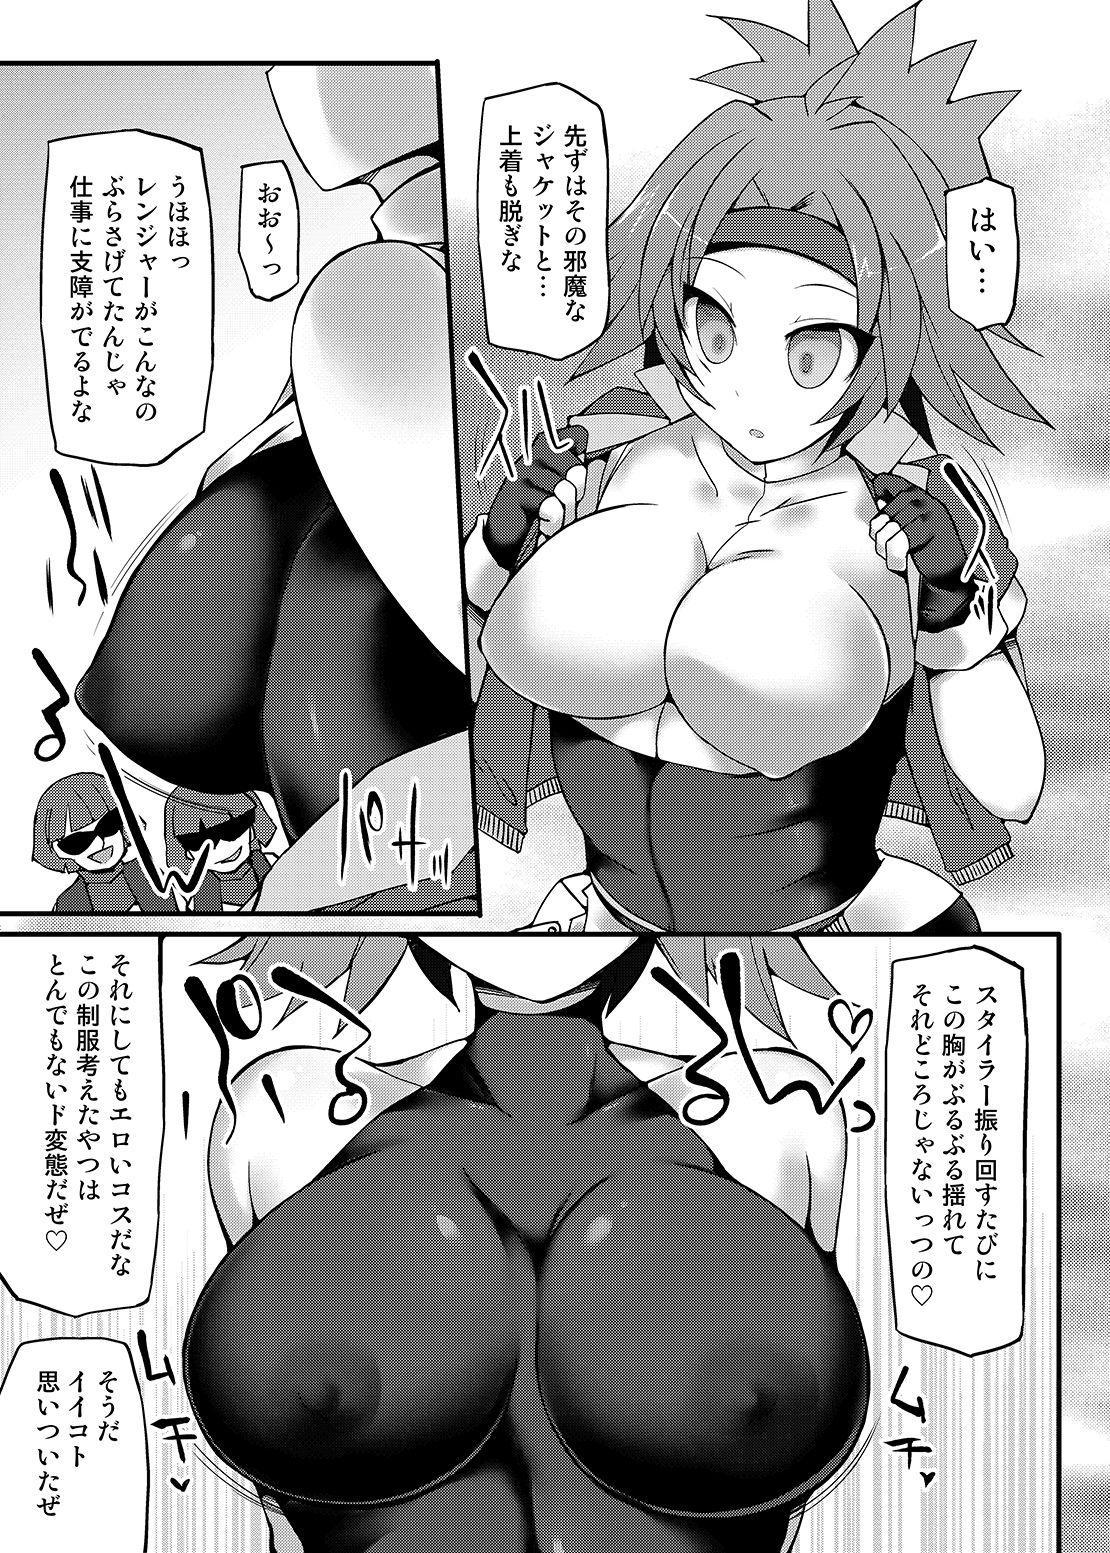 [Stapspats (Hisui)] Stapspats [Pocket Monster Saimin Series Soushuuhen] 1 Collective Hypnosis (Pokémon) [Digital] 25